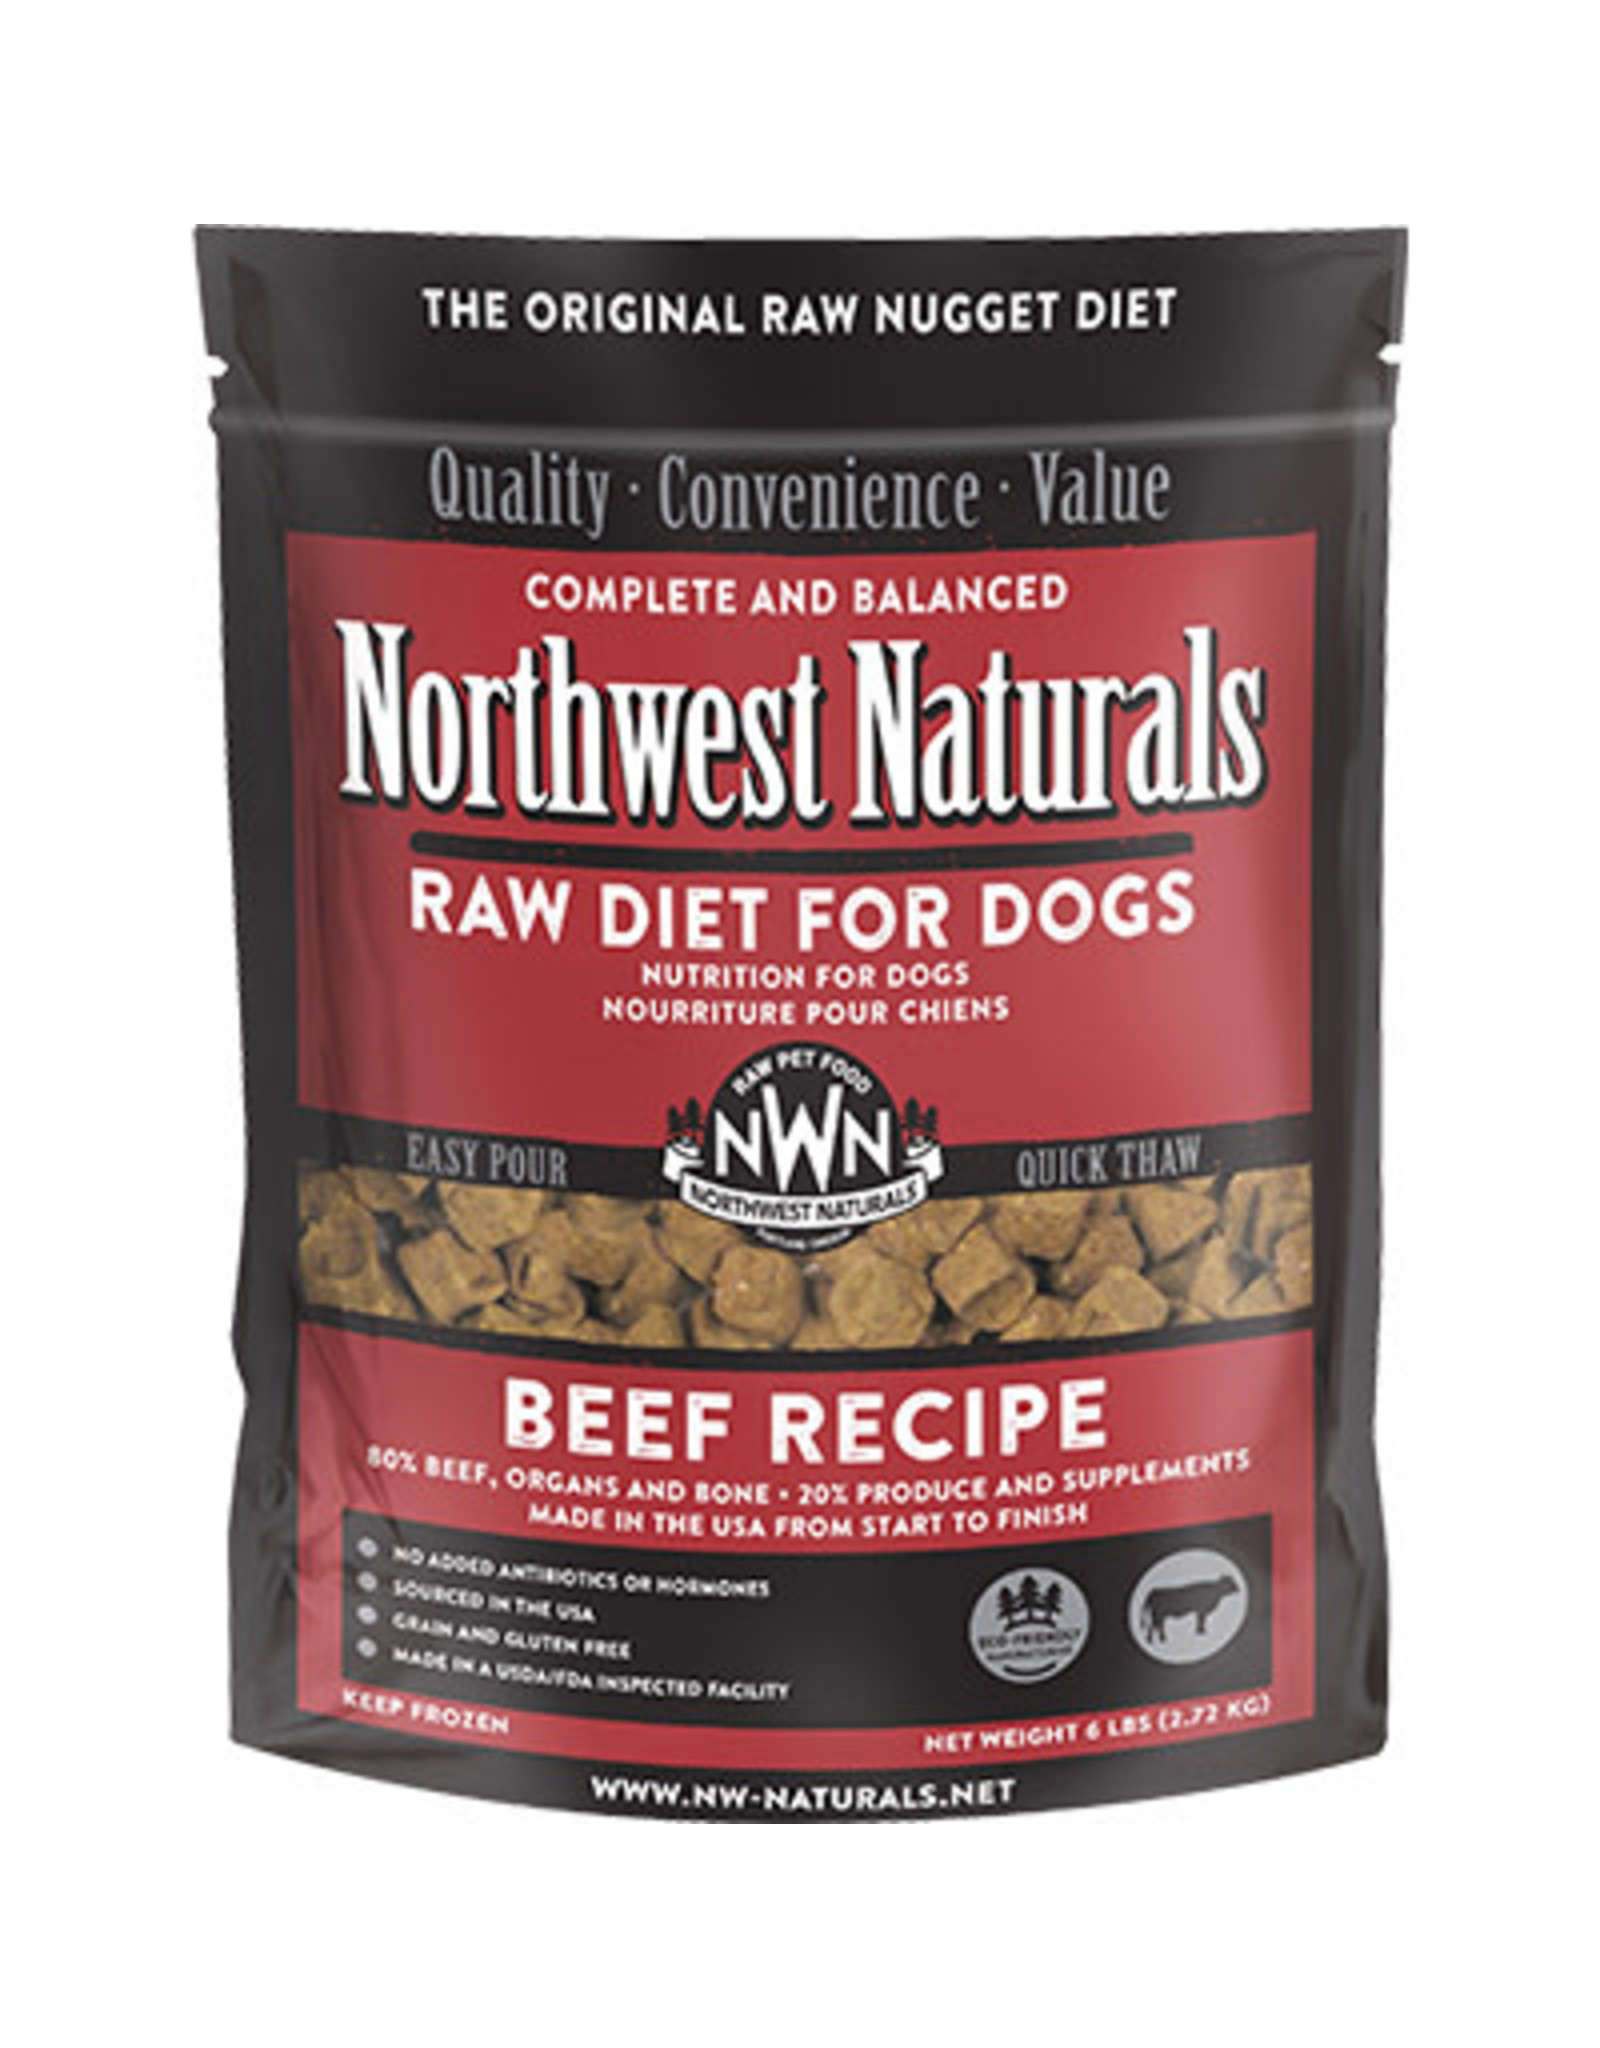 Northwest Naturals Northwest Naturals Raw Diet for Dogs Freeze Dried Nuggets Beef Recipe 12oz